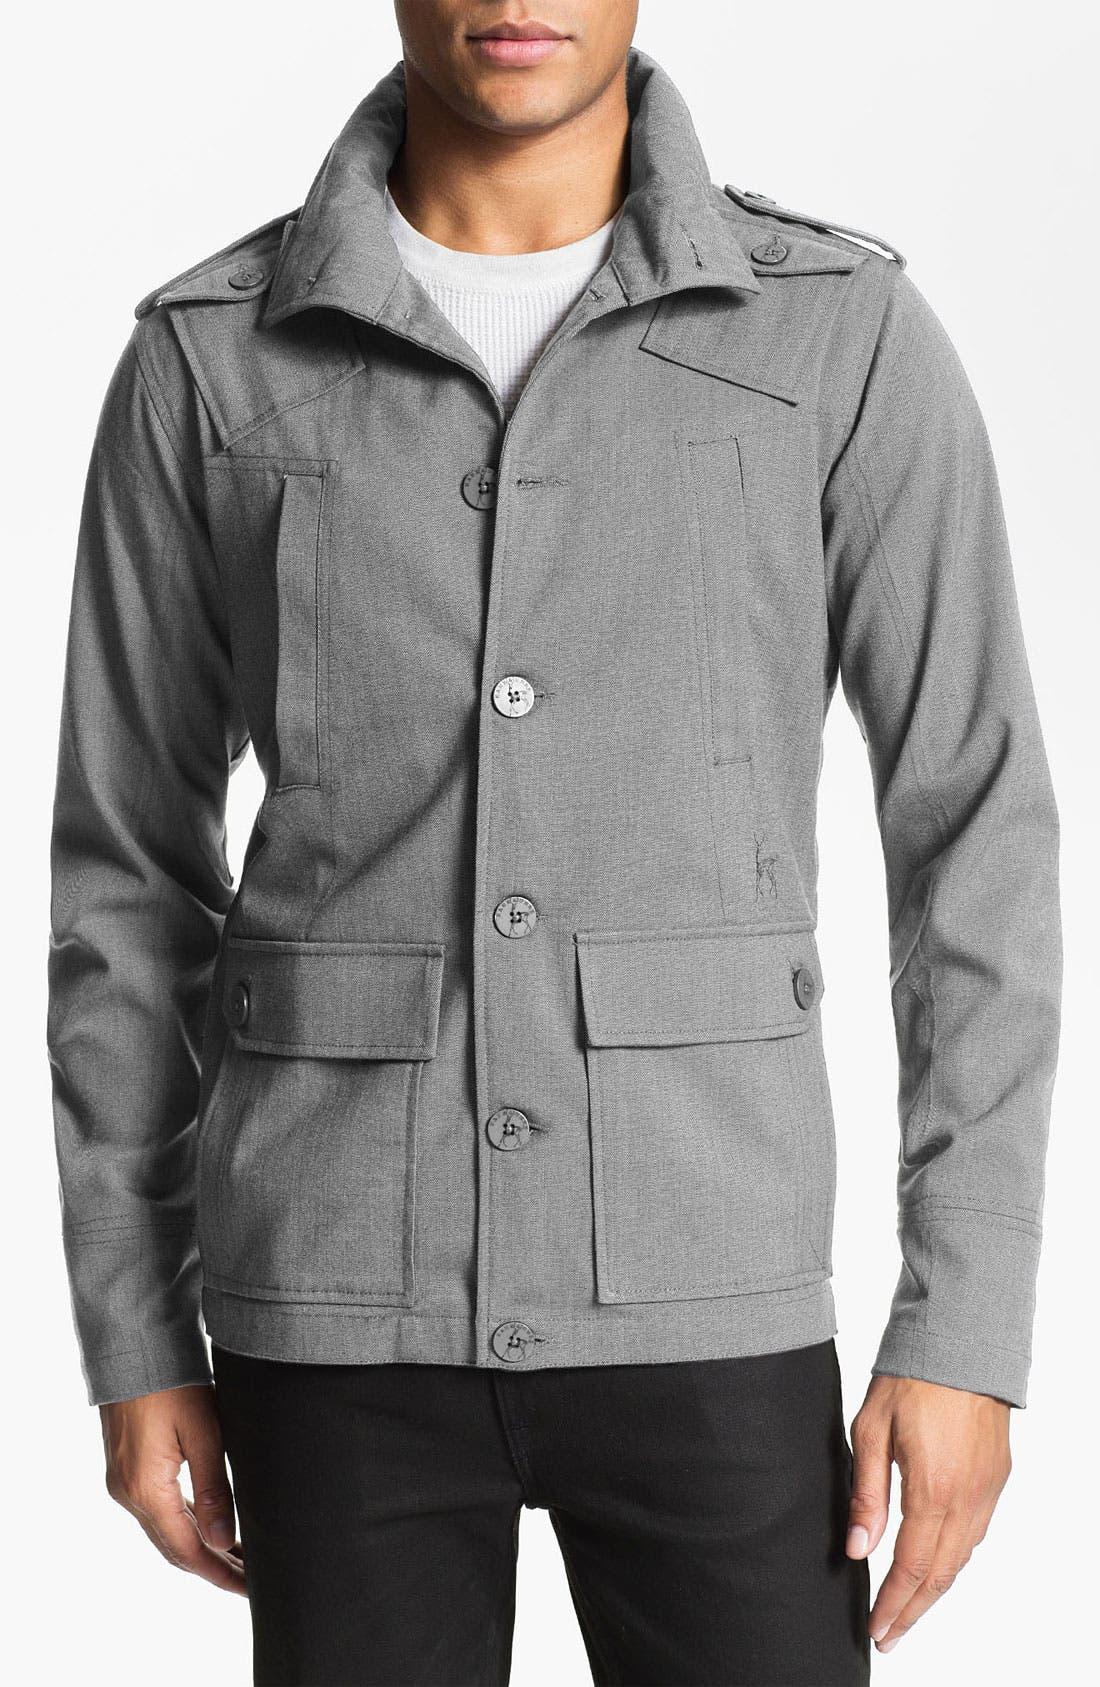 Alternate Image 1 Selected - Kane & Unke Herringbone Trim Fit Military Jacket